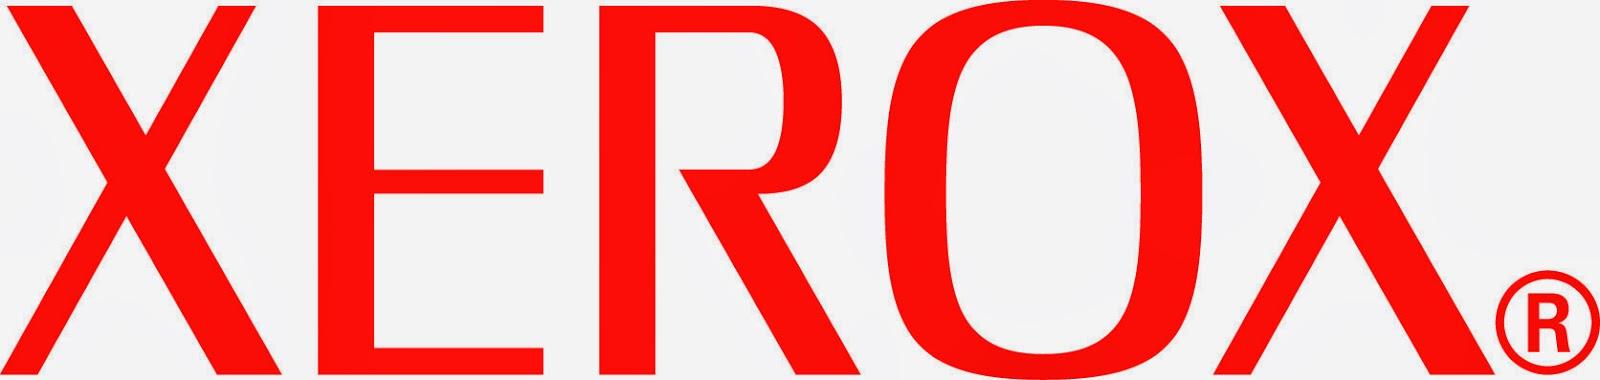 Xerox sluit resellerovereenkomst met Sihl Direct - Printer ...  Xerox sluit res...